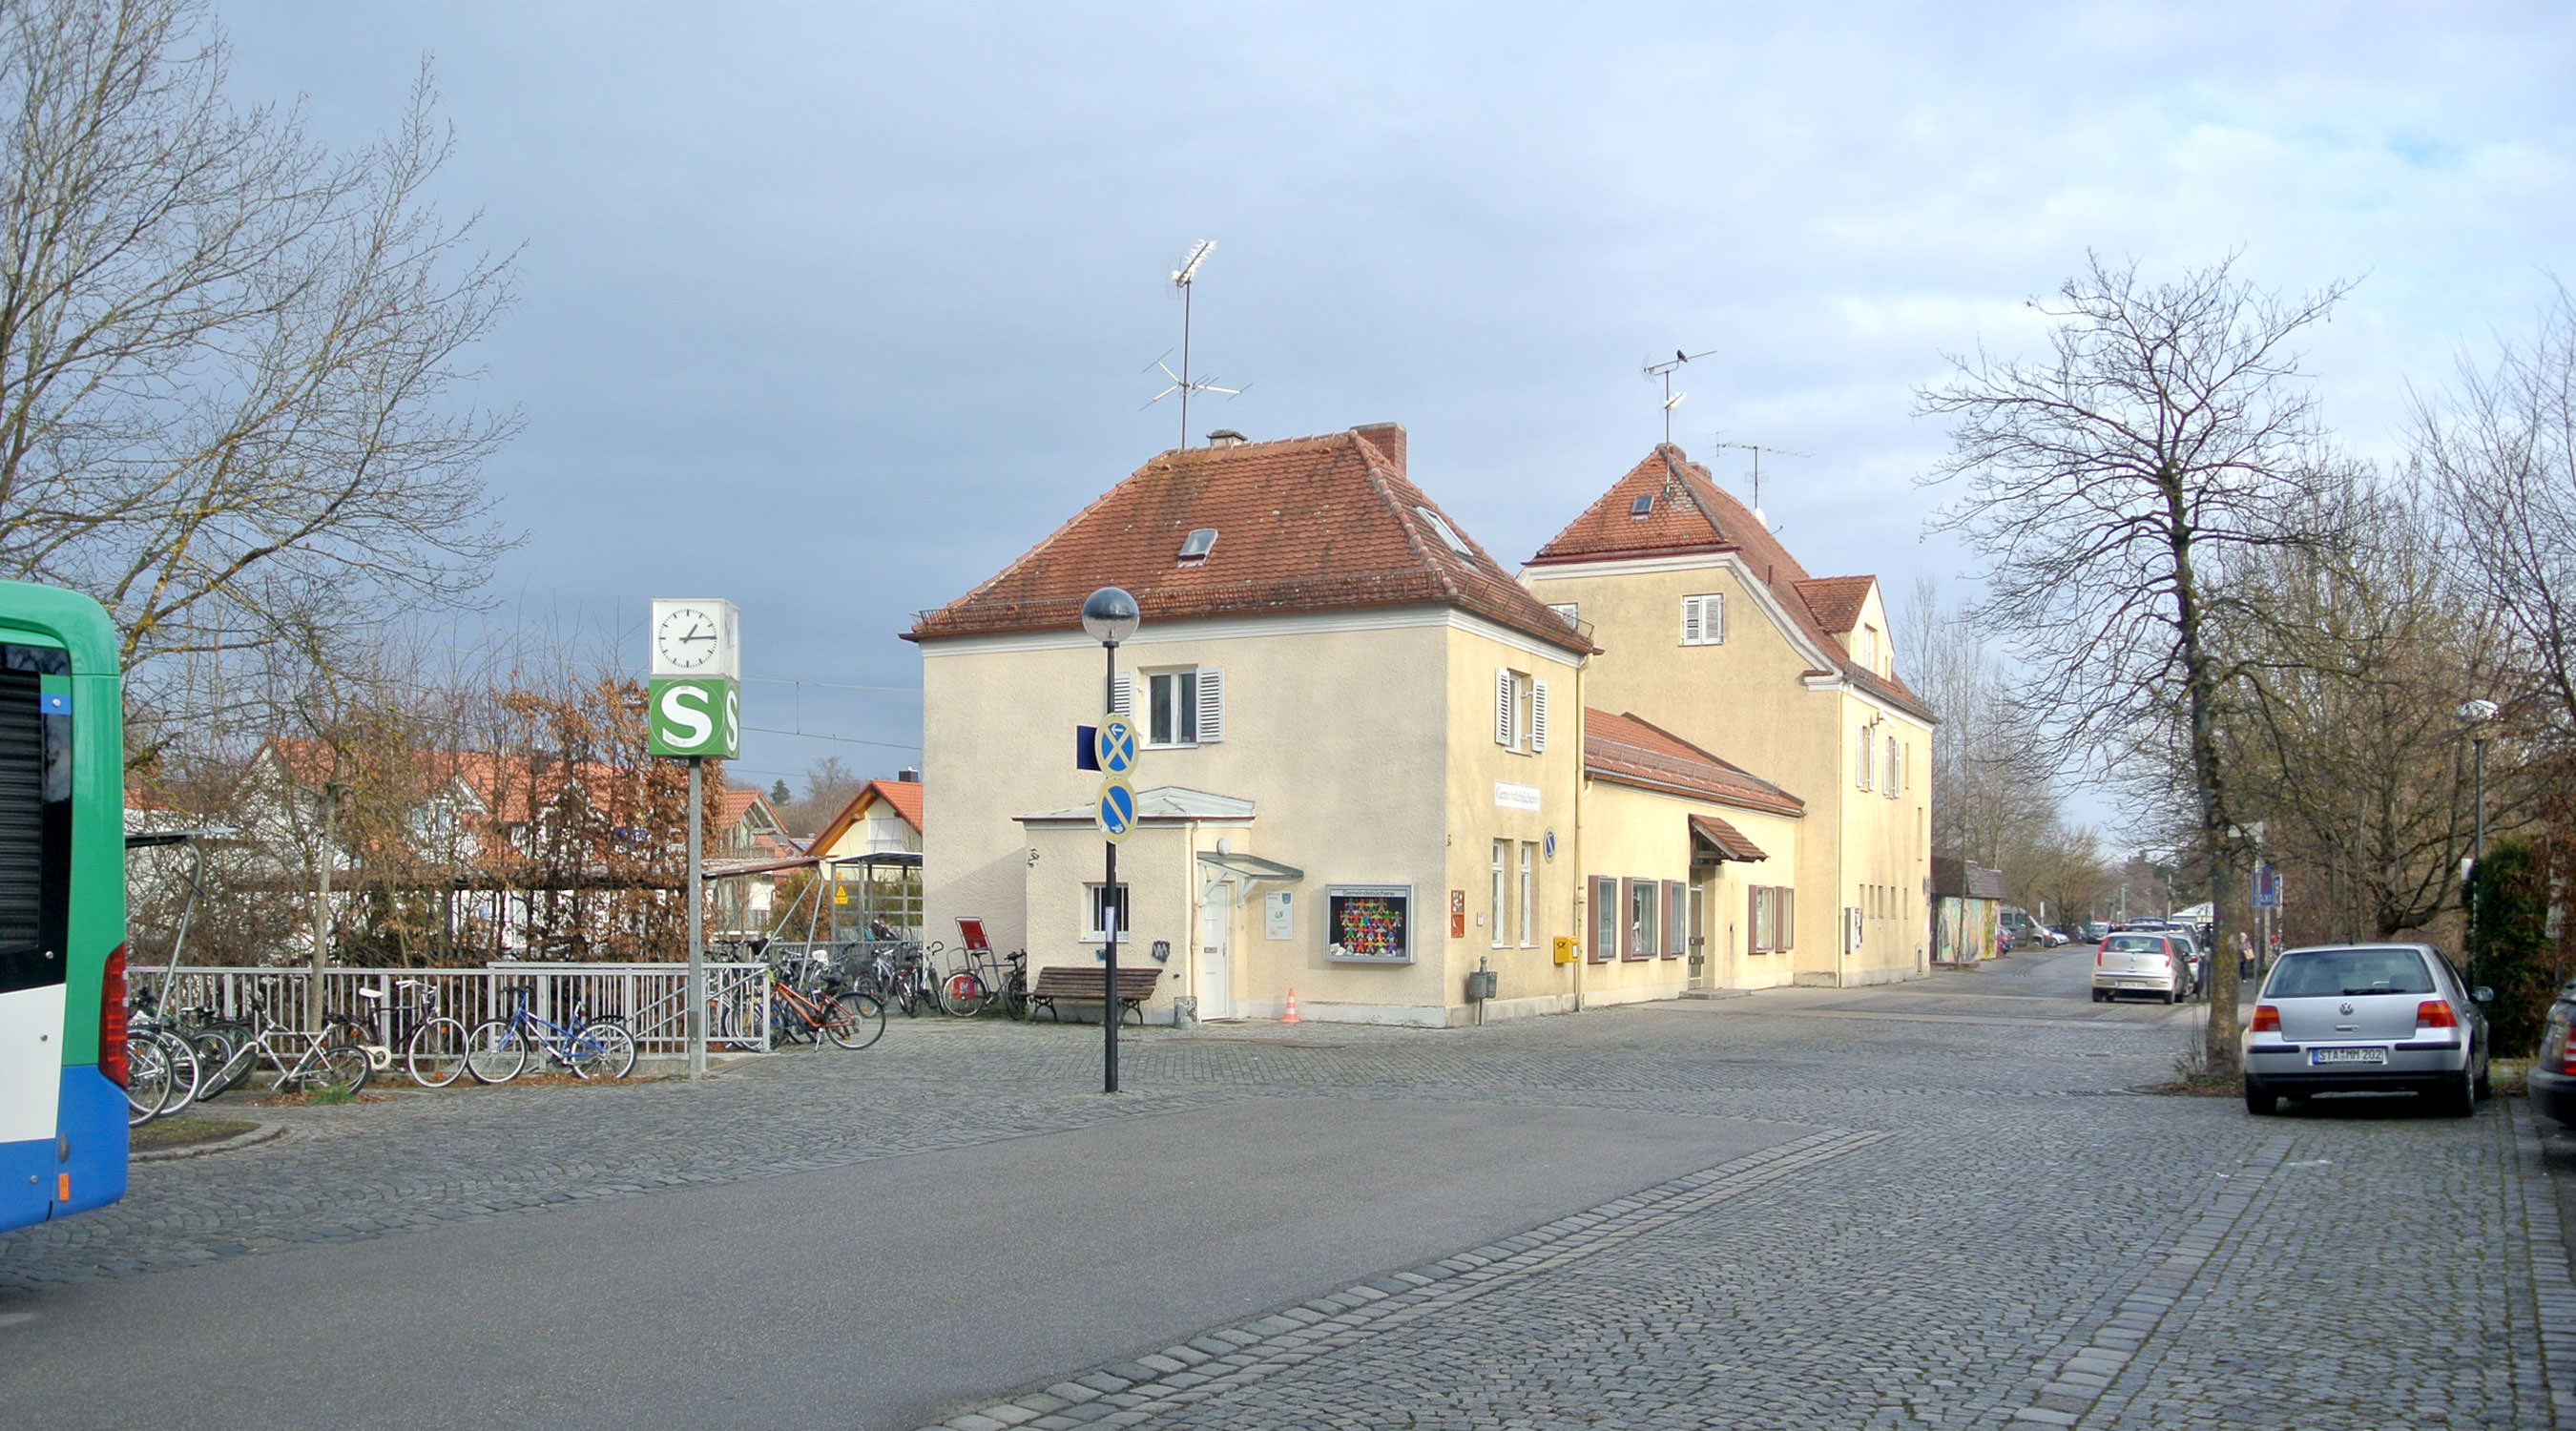 Wessling Bahnhof Bestand